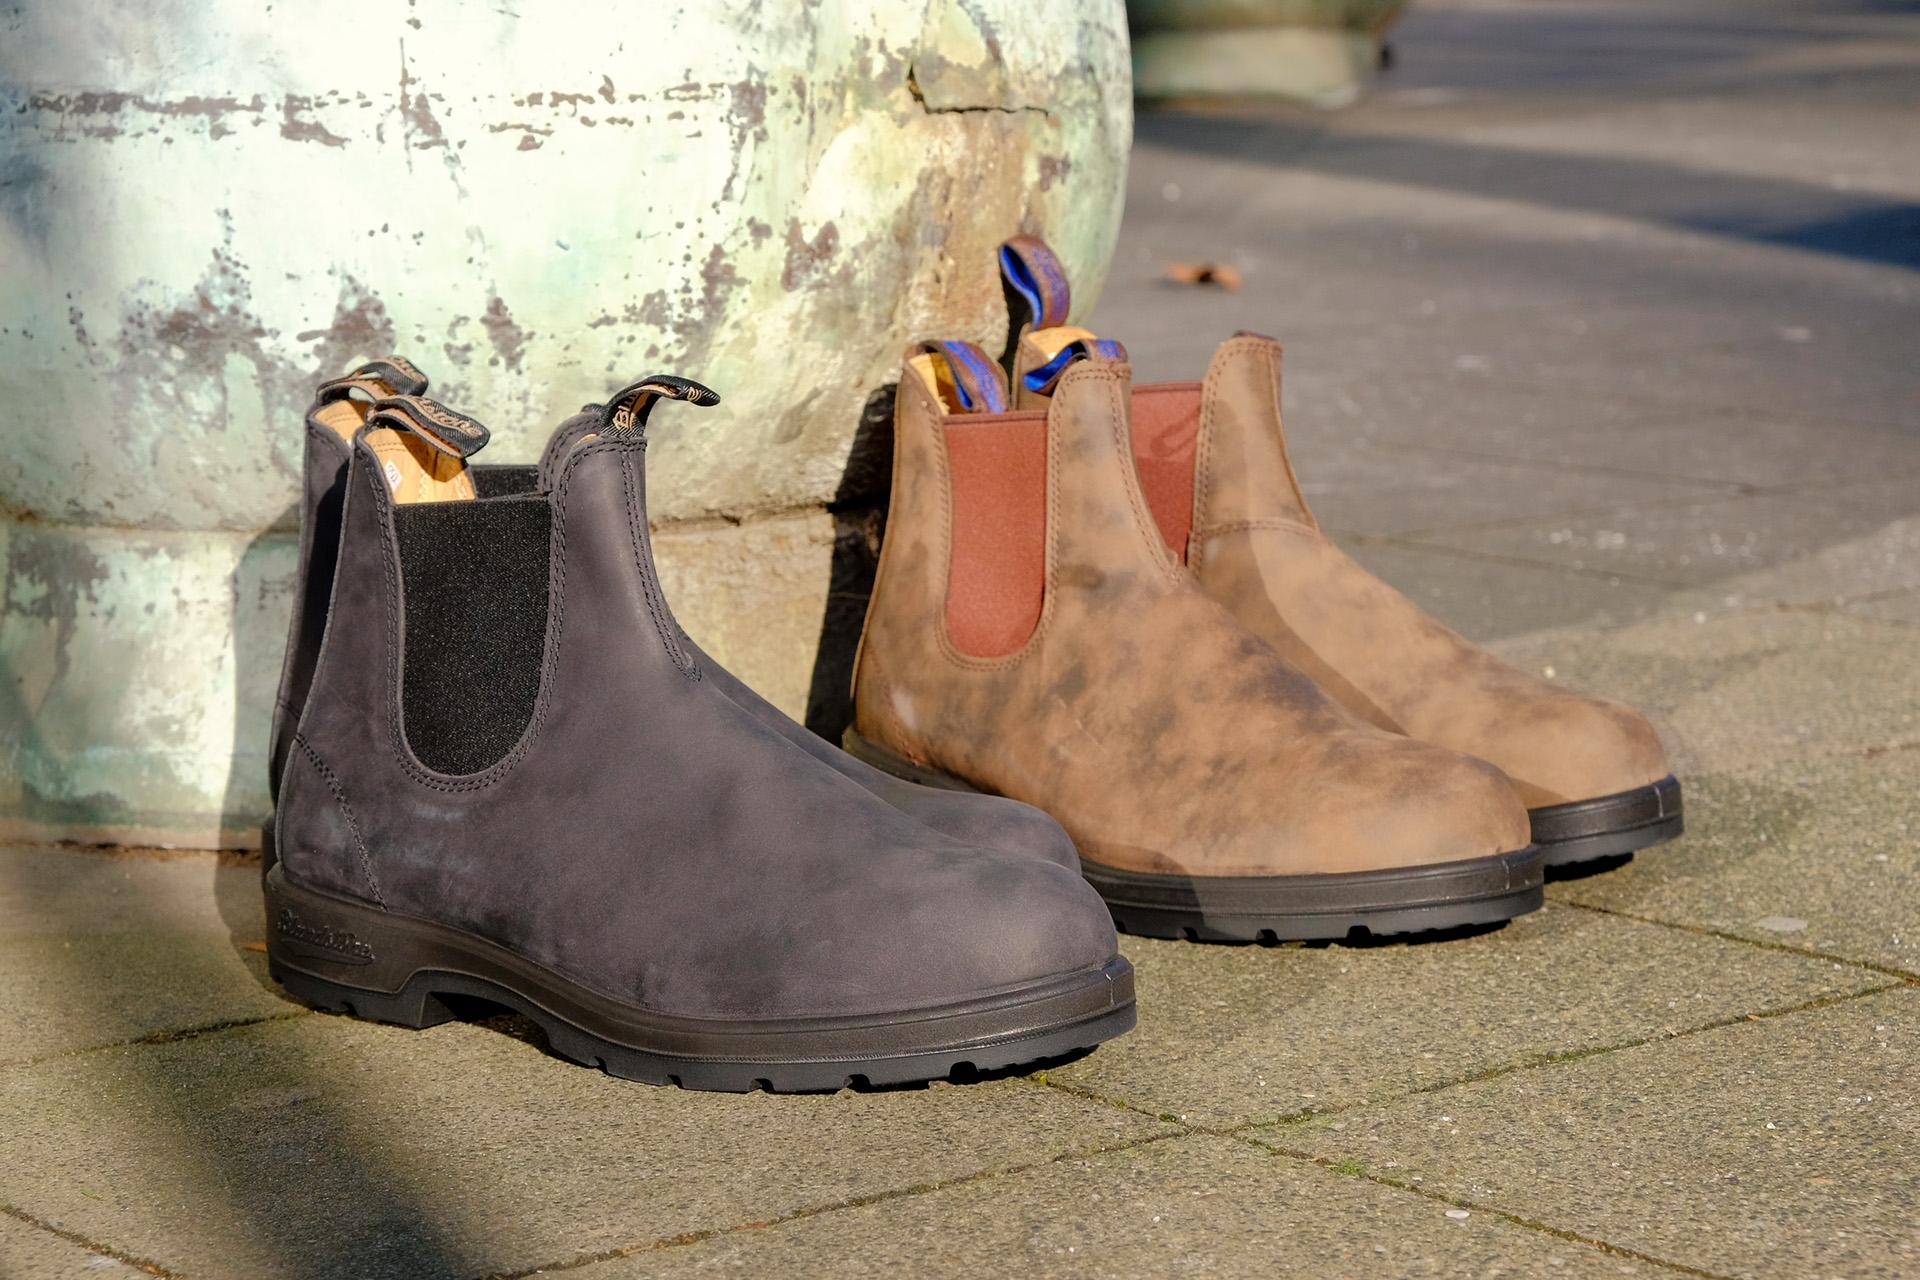 blundstones-stiefel-chelseaboots-rustic-black-brown-leder